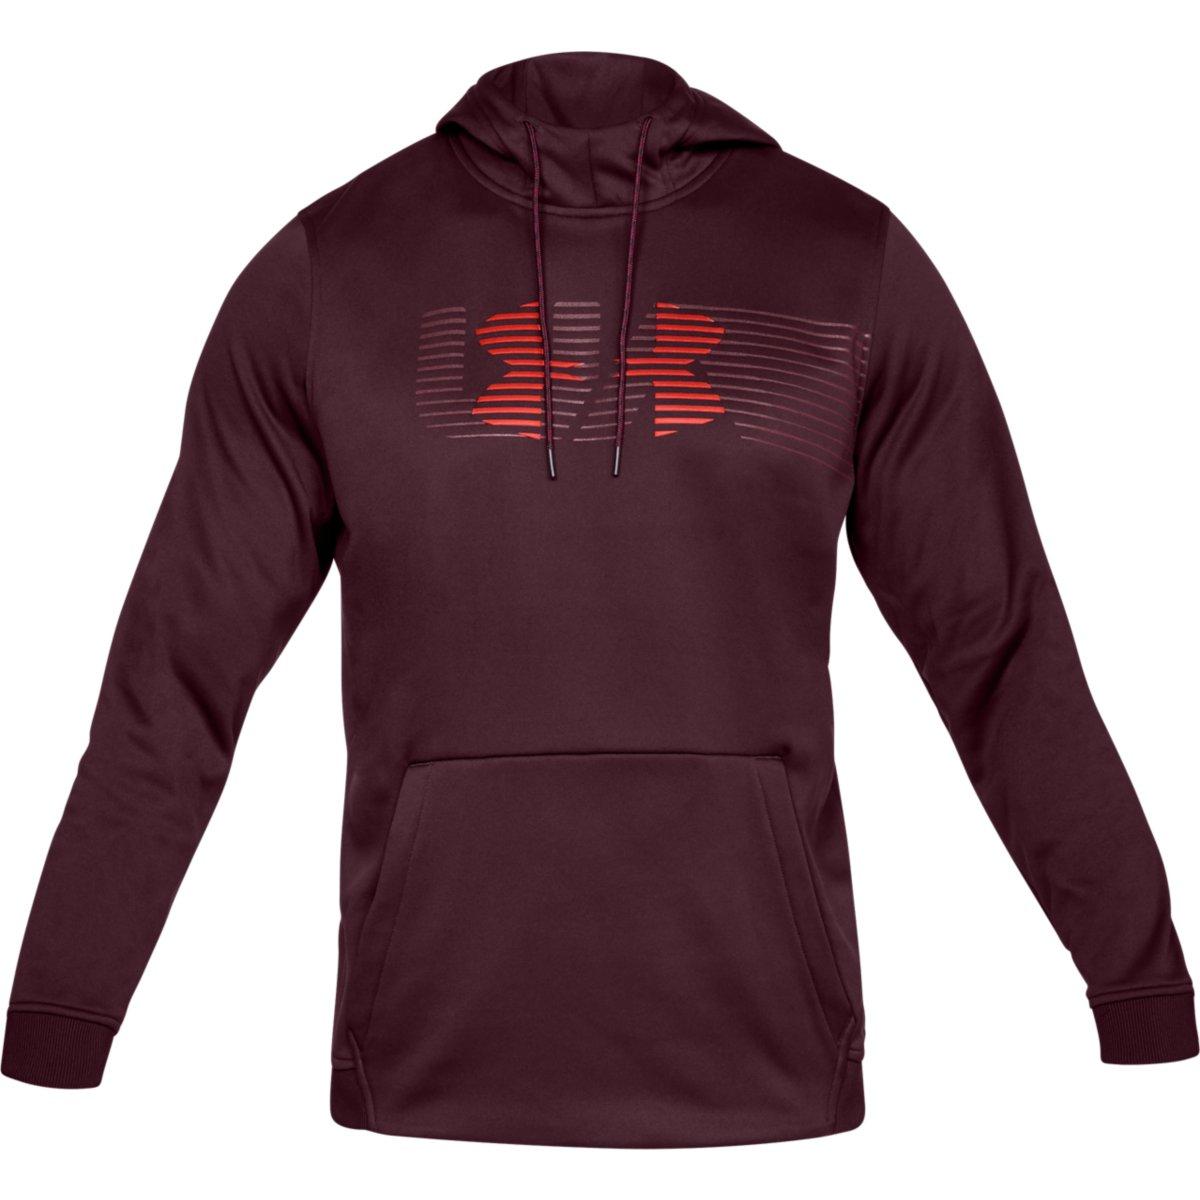 Under Armour Men's Armour Fleece Spectrum Pullover Hoodie - Red, XXL